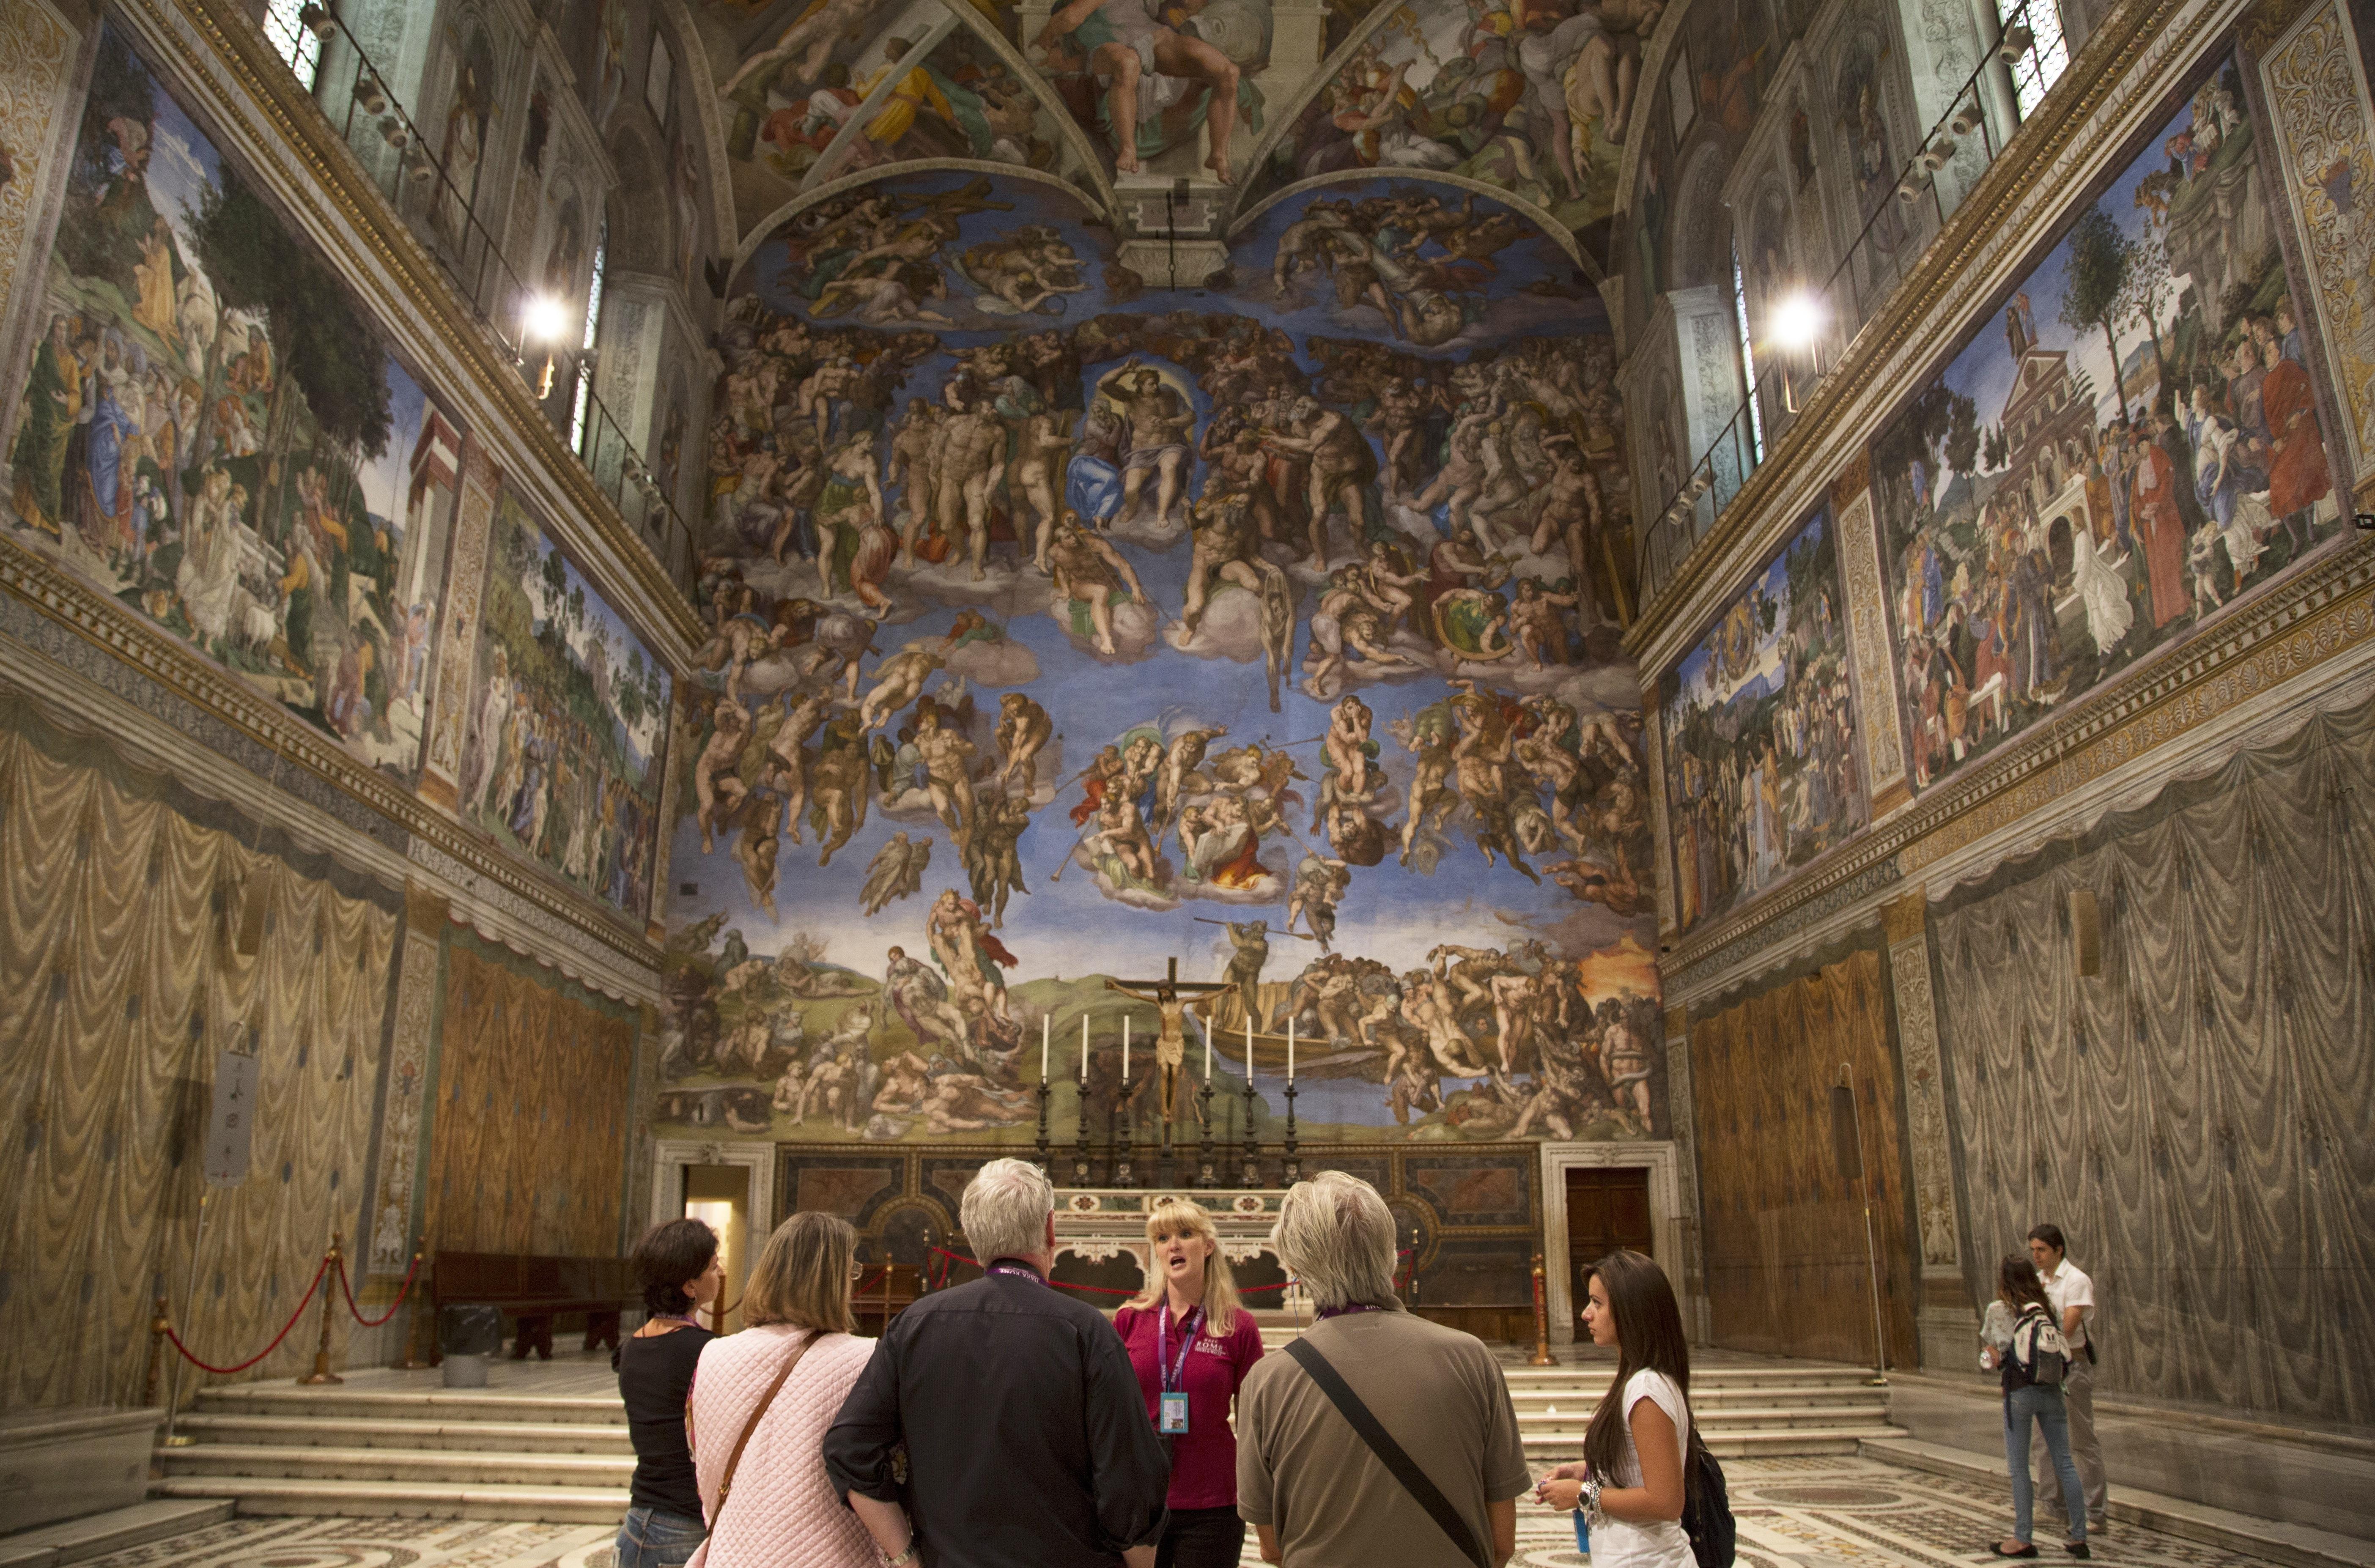 Inside the Sistine Chapel, Vatican City